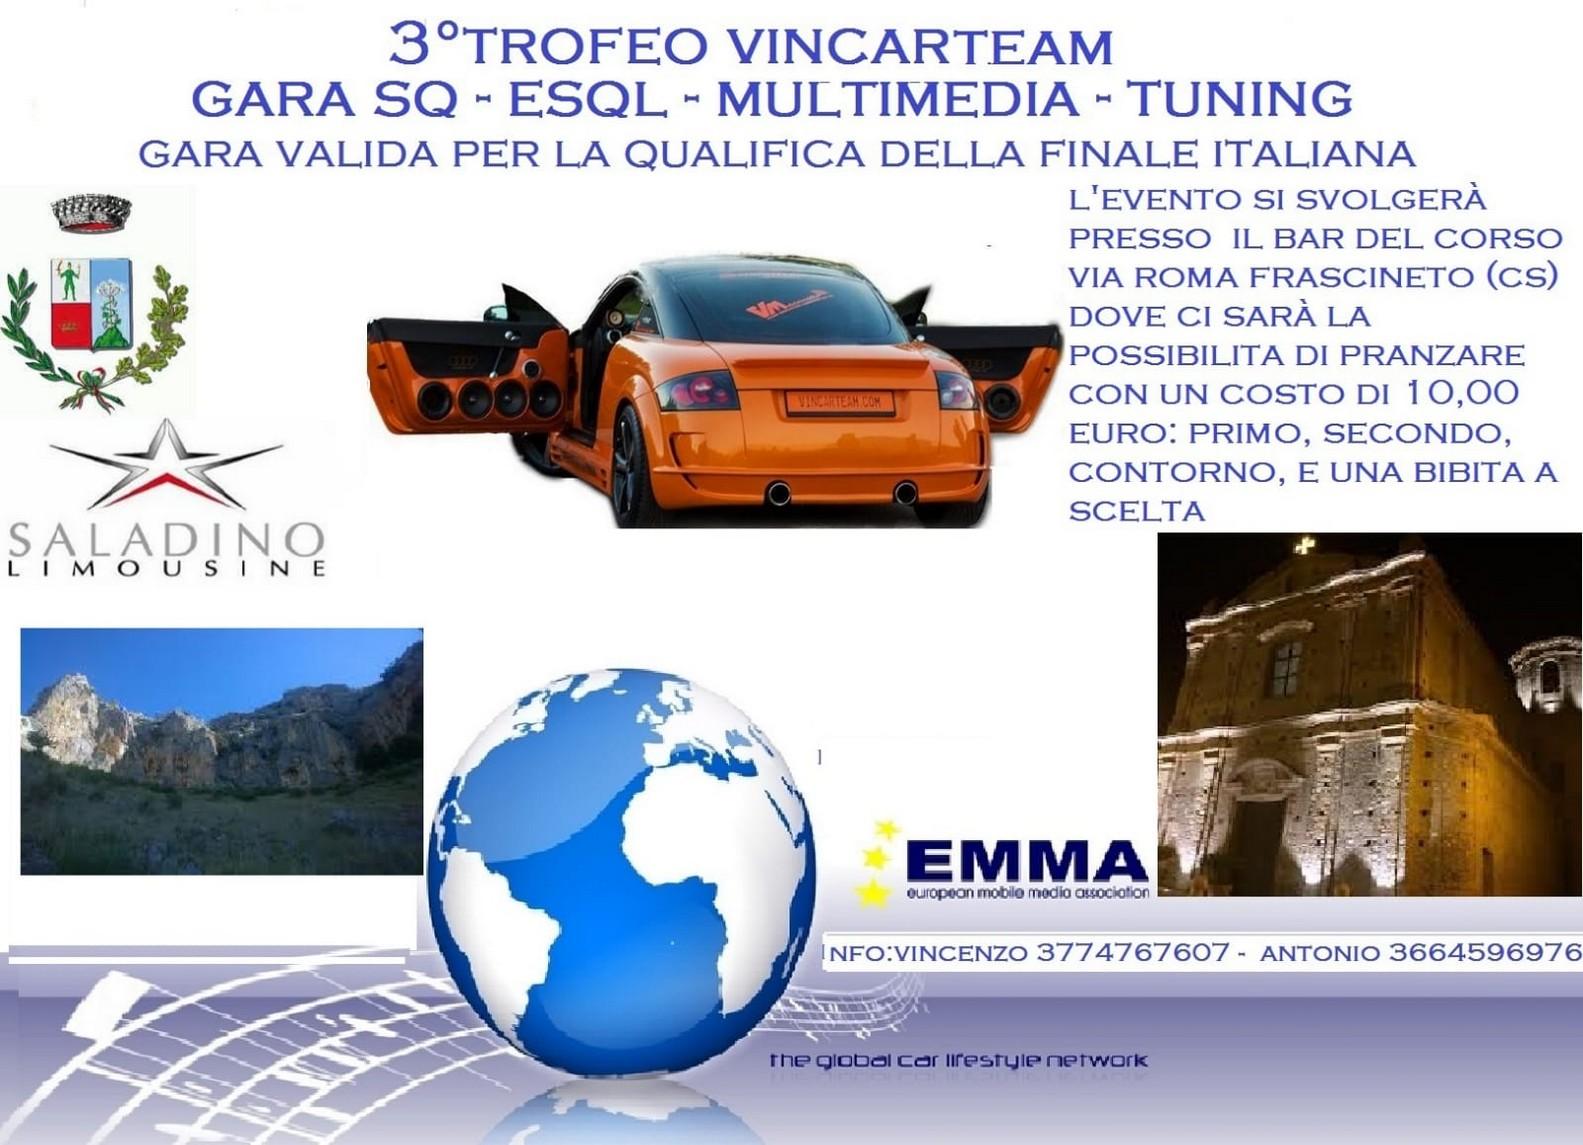 EMMA ITALY - 3° Trofeo VincarTeam - Frascineto @ Via Roma | Frascineto | Calabria | Italy